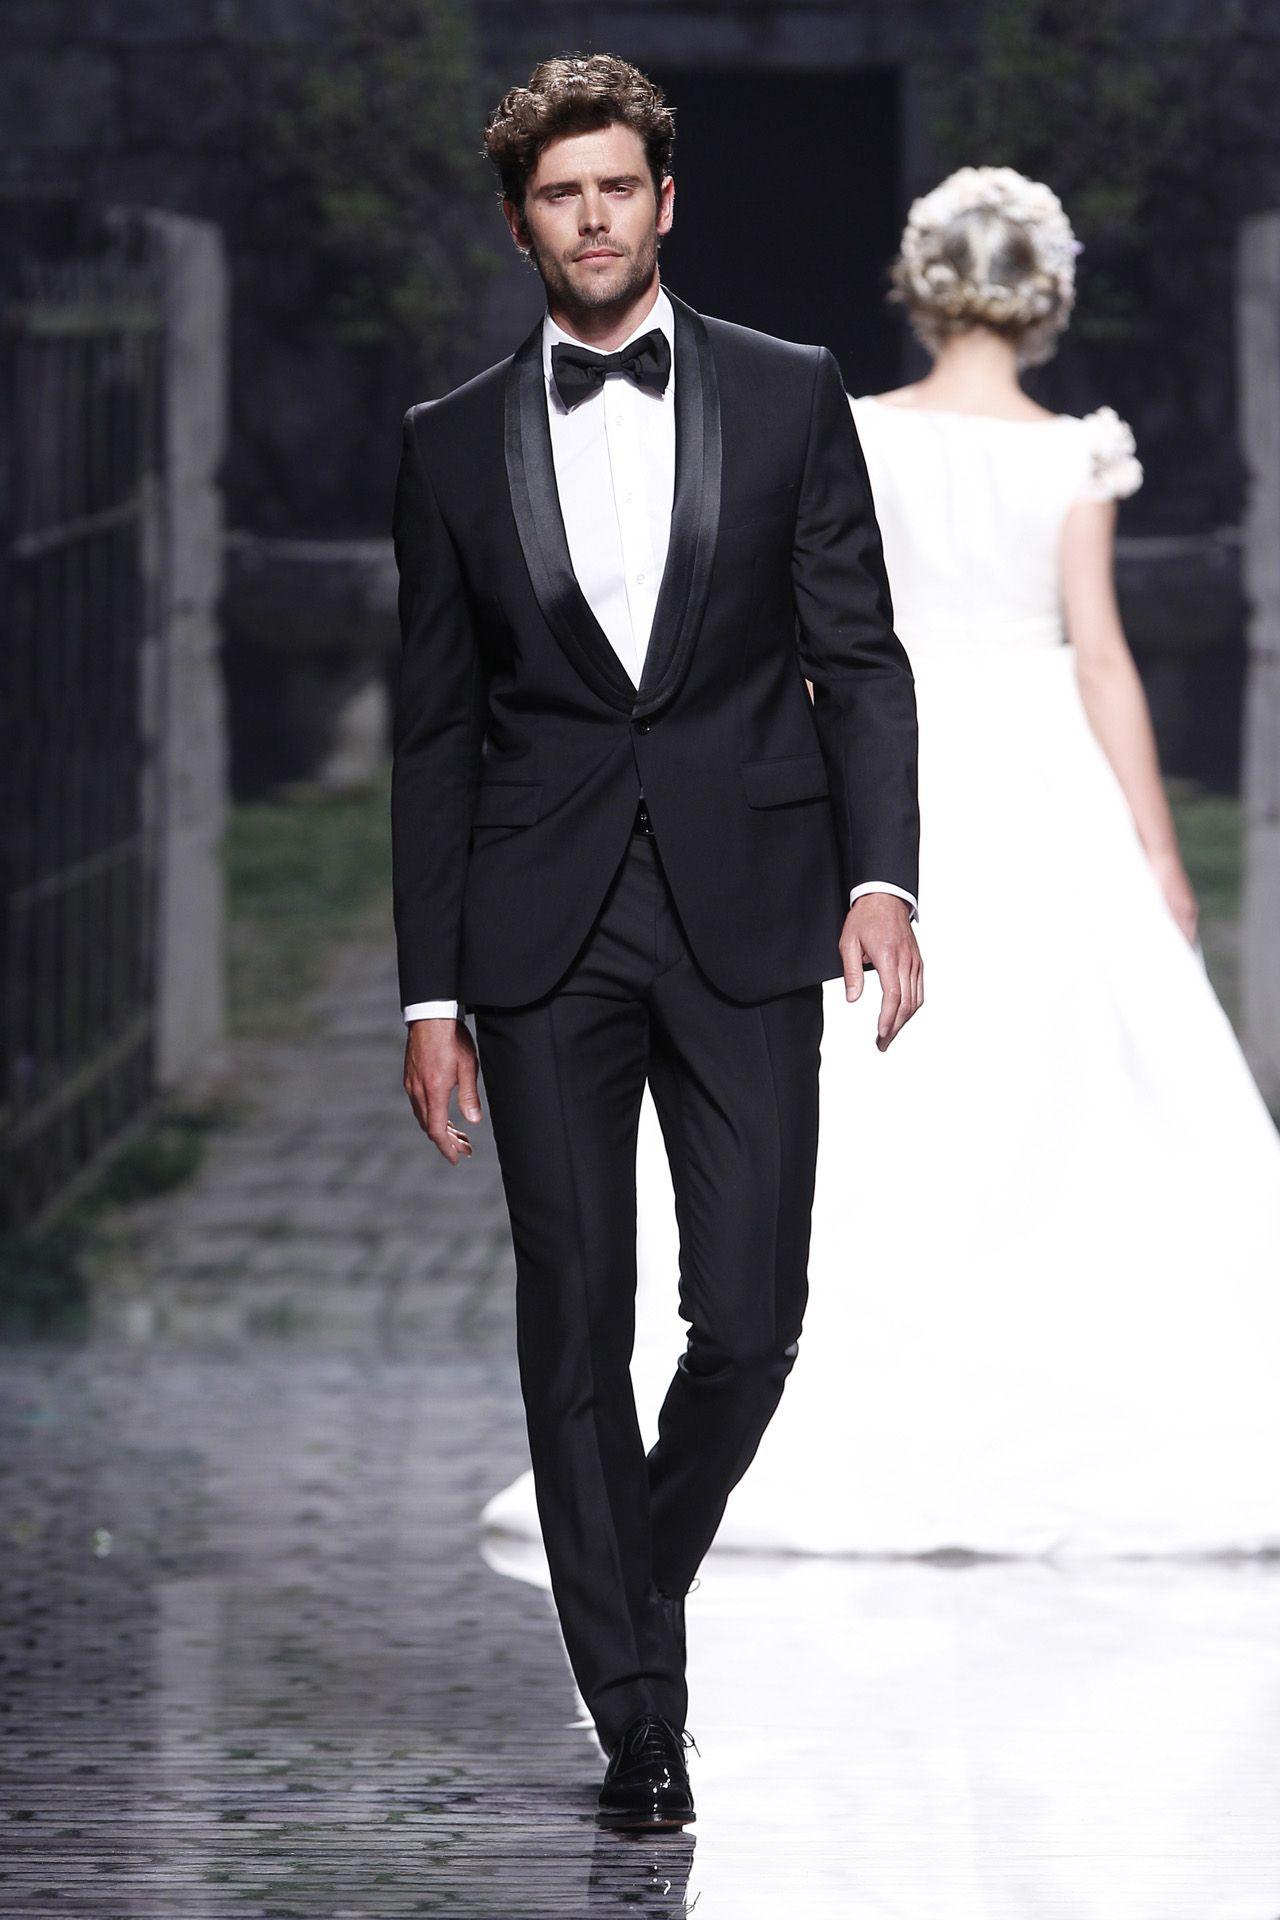 Wedding Ideas, Planning & Inspiration in 2020 Wedding